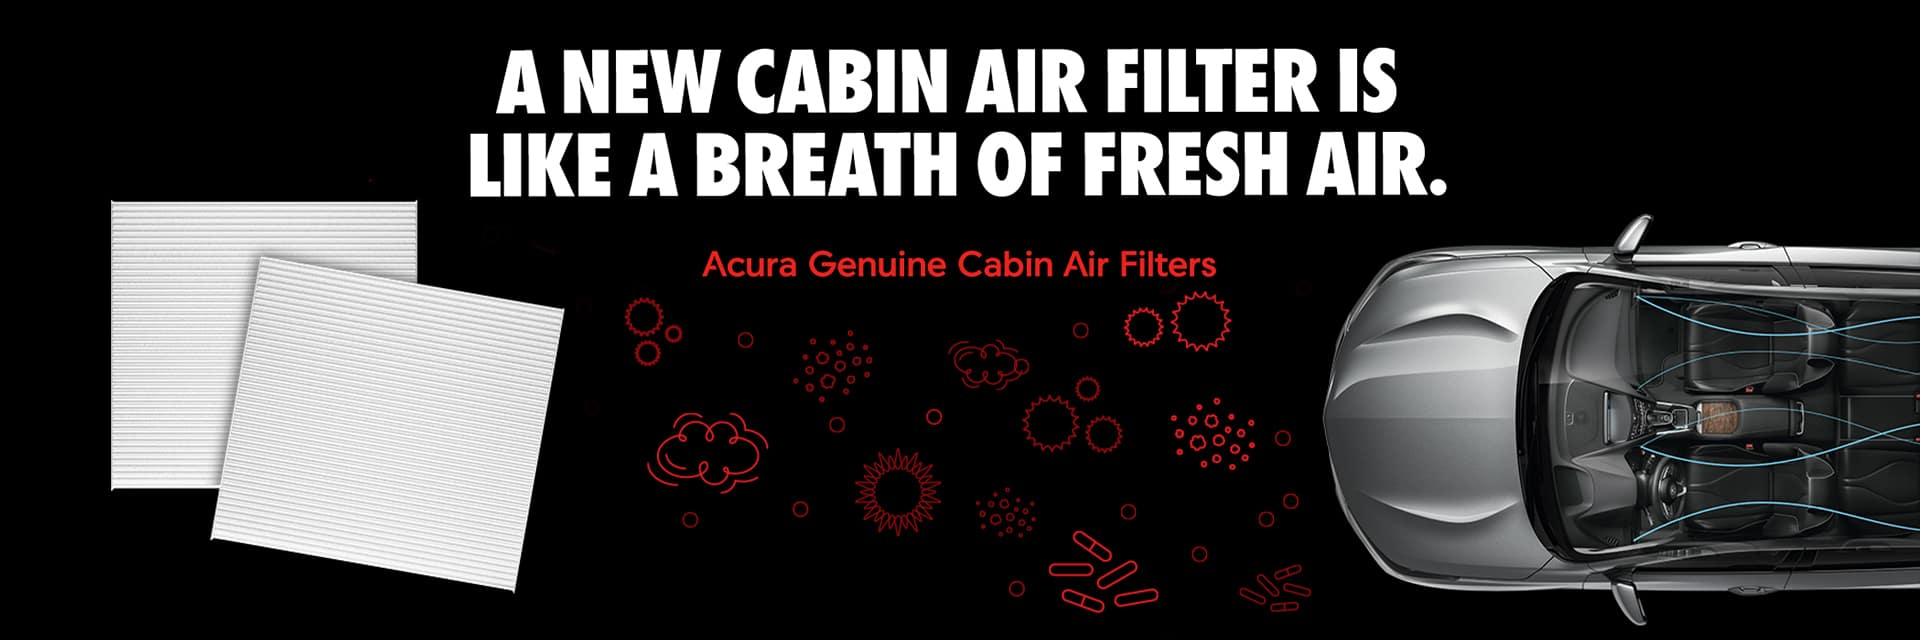 EAG_EAcura_Banner_Cabin_Air_Filter